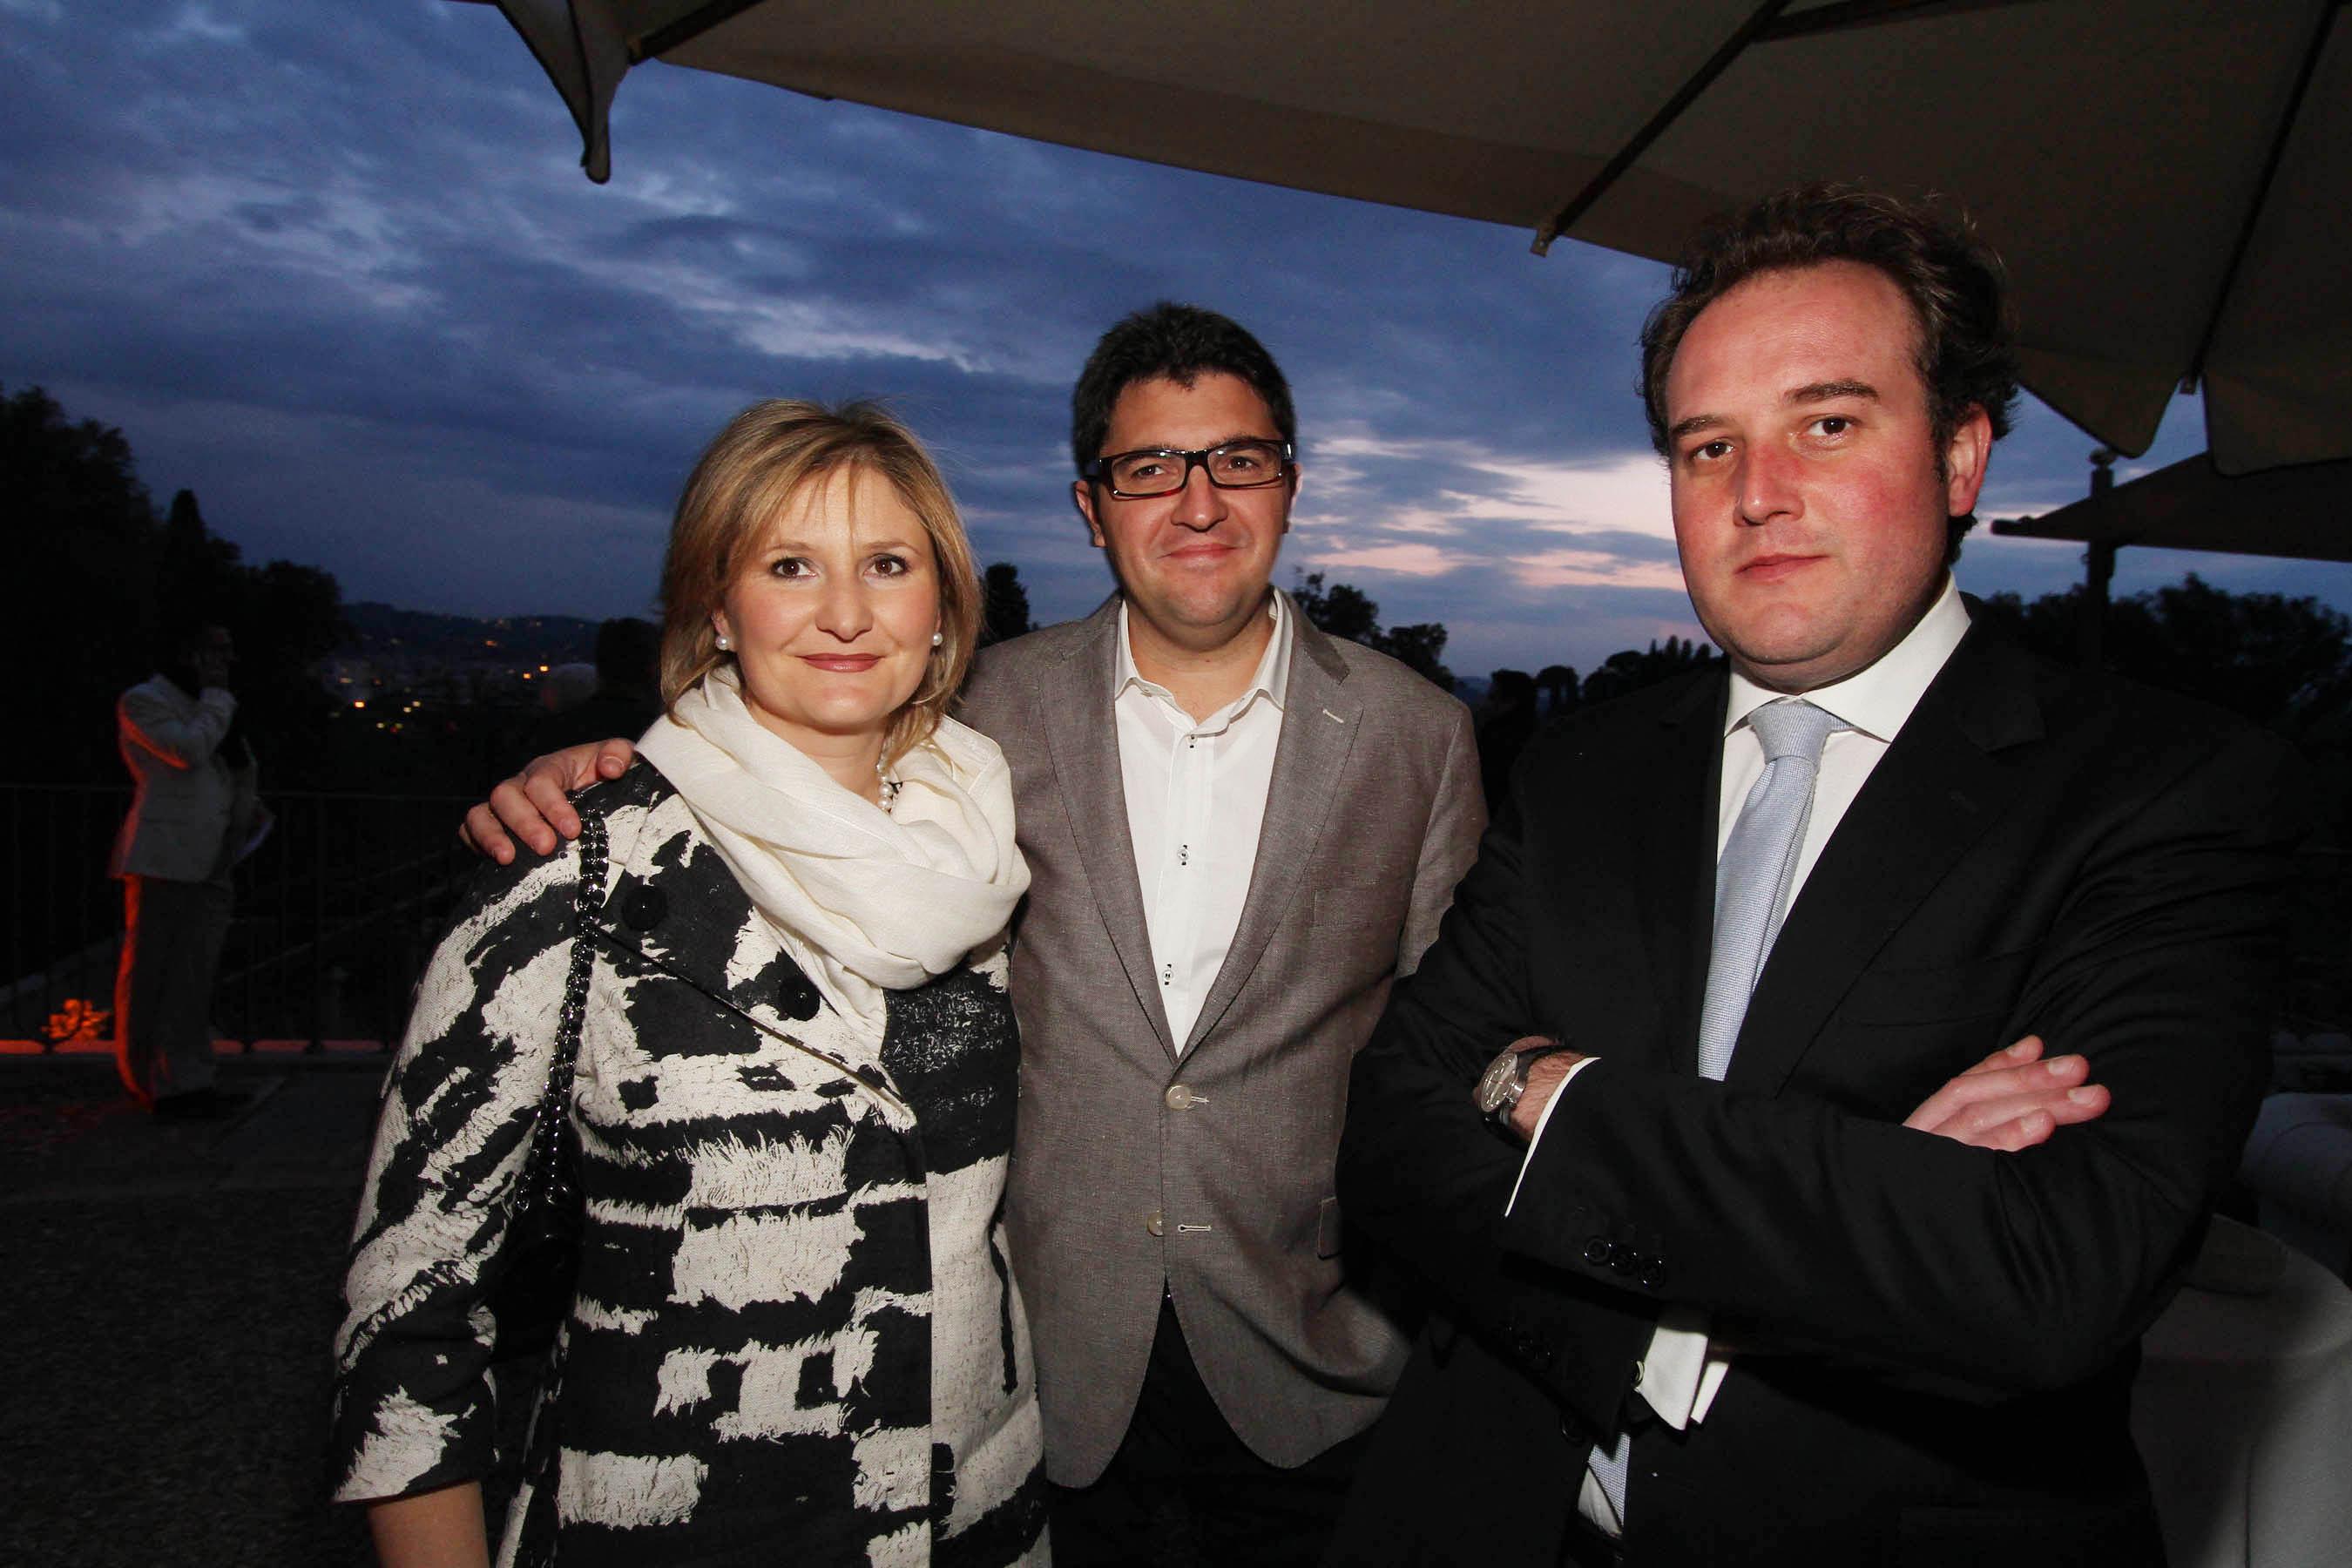 PRESSPHOTO Firenze, festa Firenze Magazine. Nella foto Adriana Basso, Simone Dal Sie e Paolo Sabadin